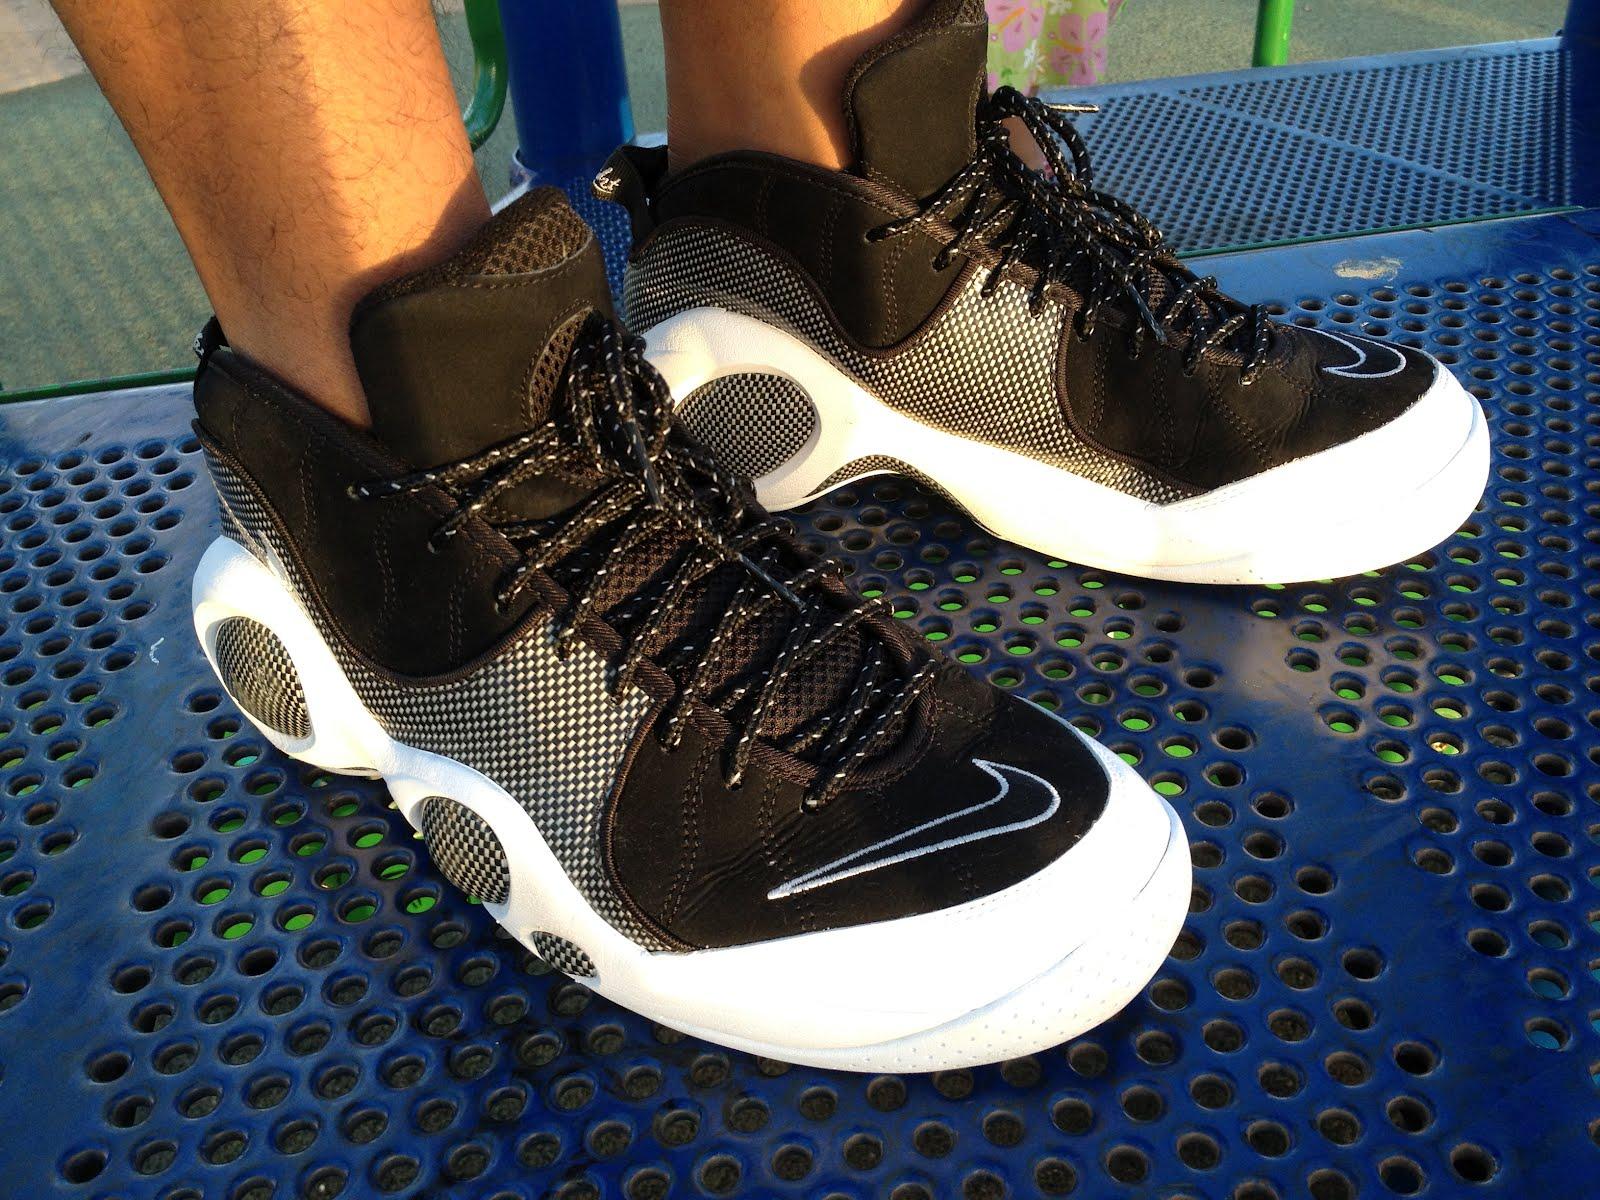 buy popular a5f37 841a1 ... Jason Kidd s Top 20 Sneakers Sole Collector  Nike Air Zoom Flight 95  Nike  Zoom Flight 95 Retro ...